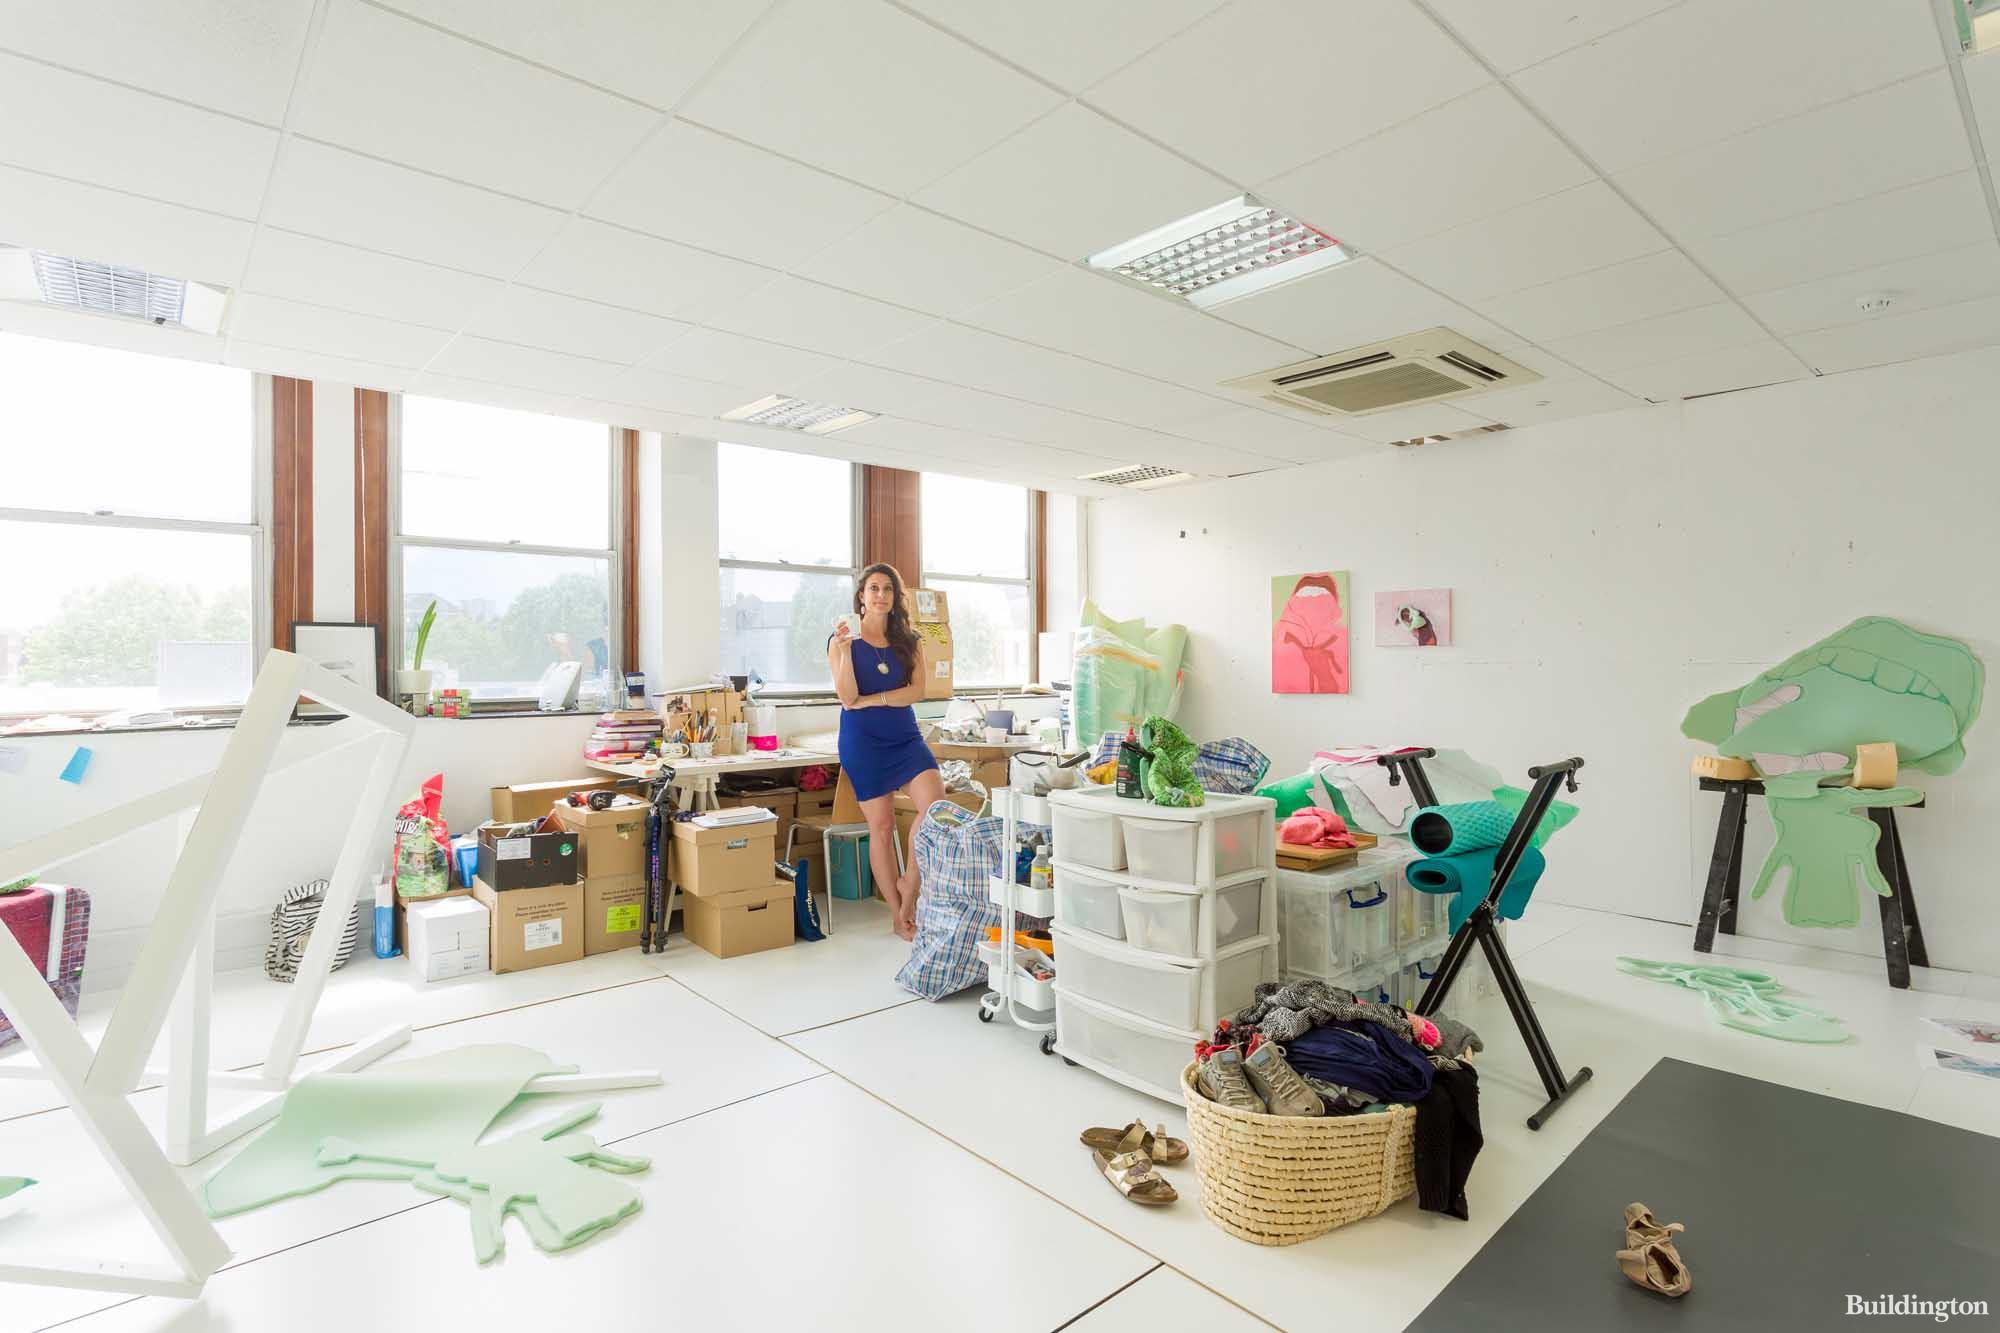 SET Woolwich studio space on Beresford Street in London SE18.